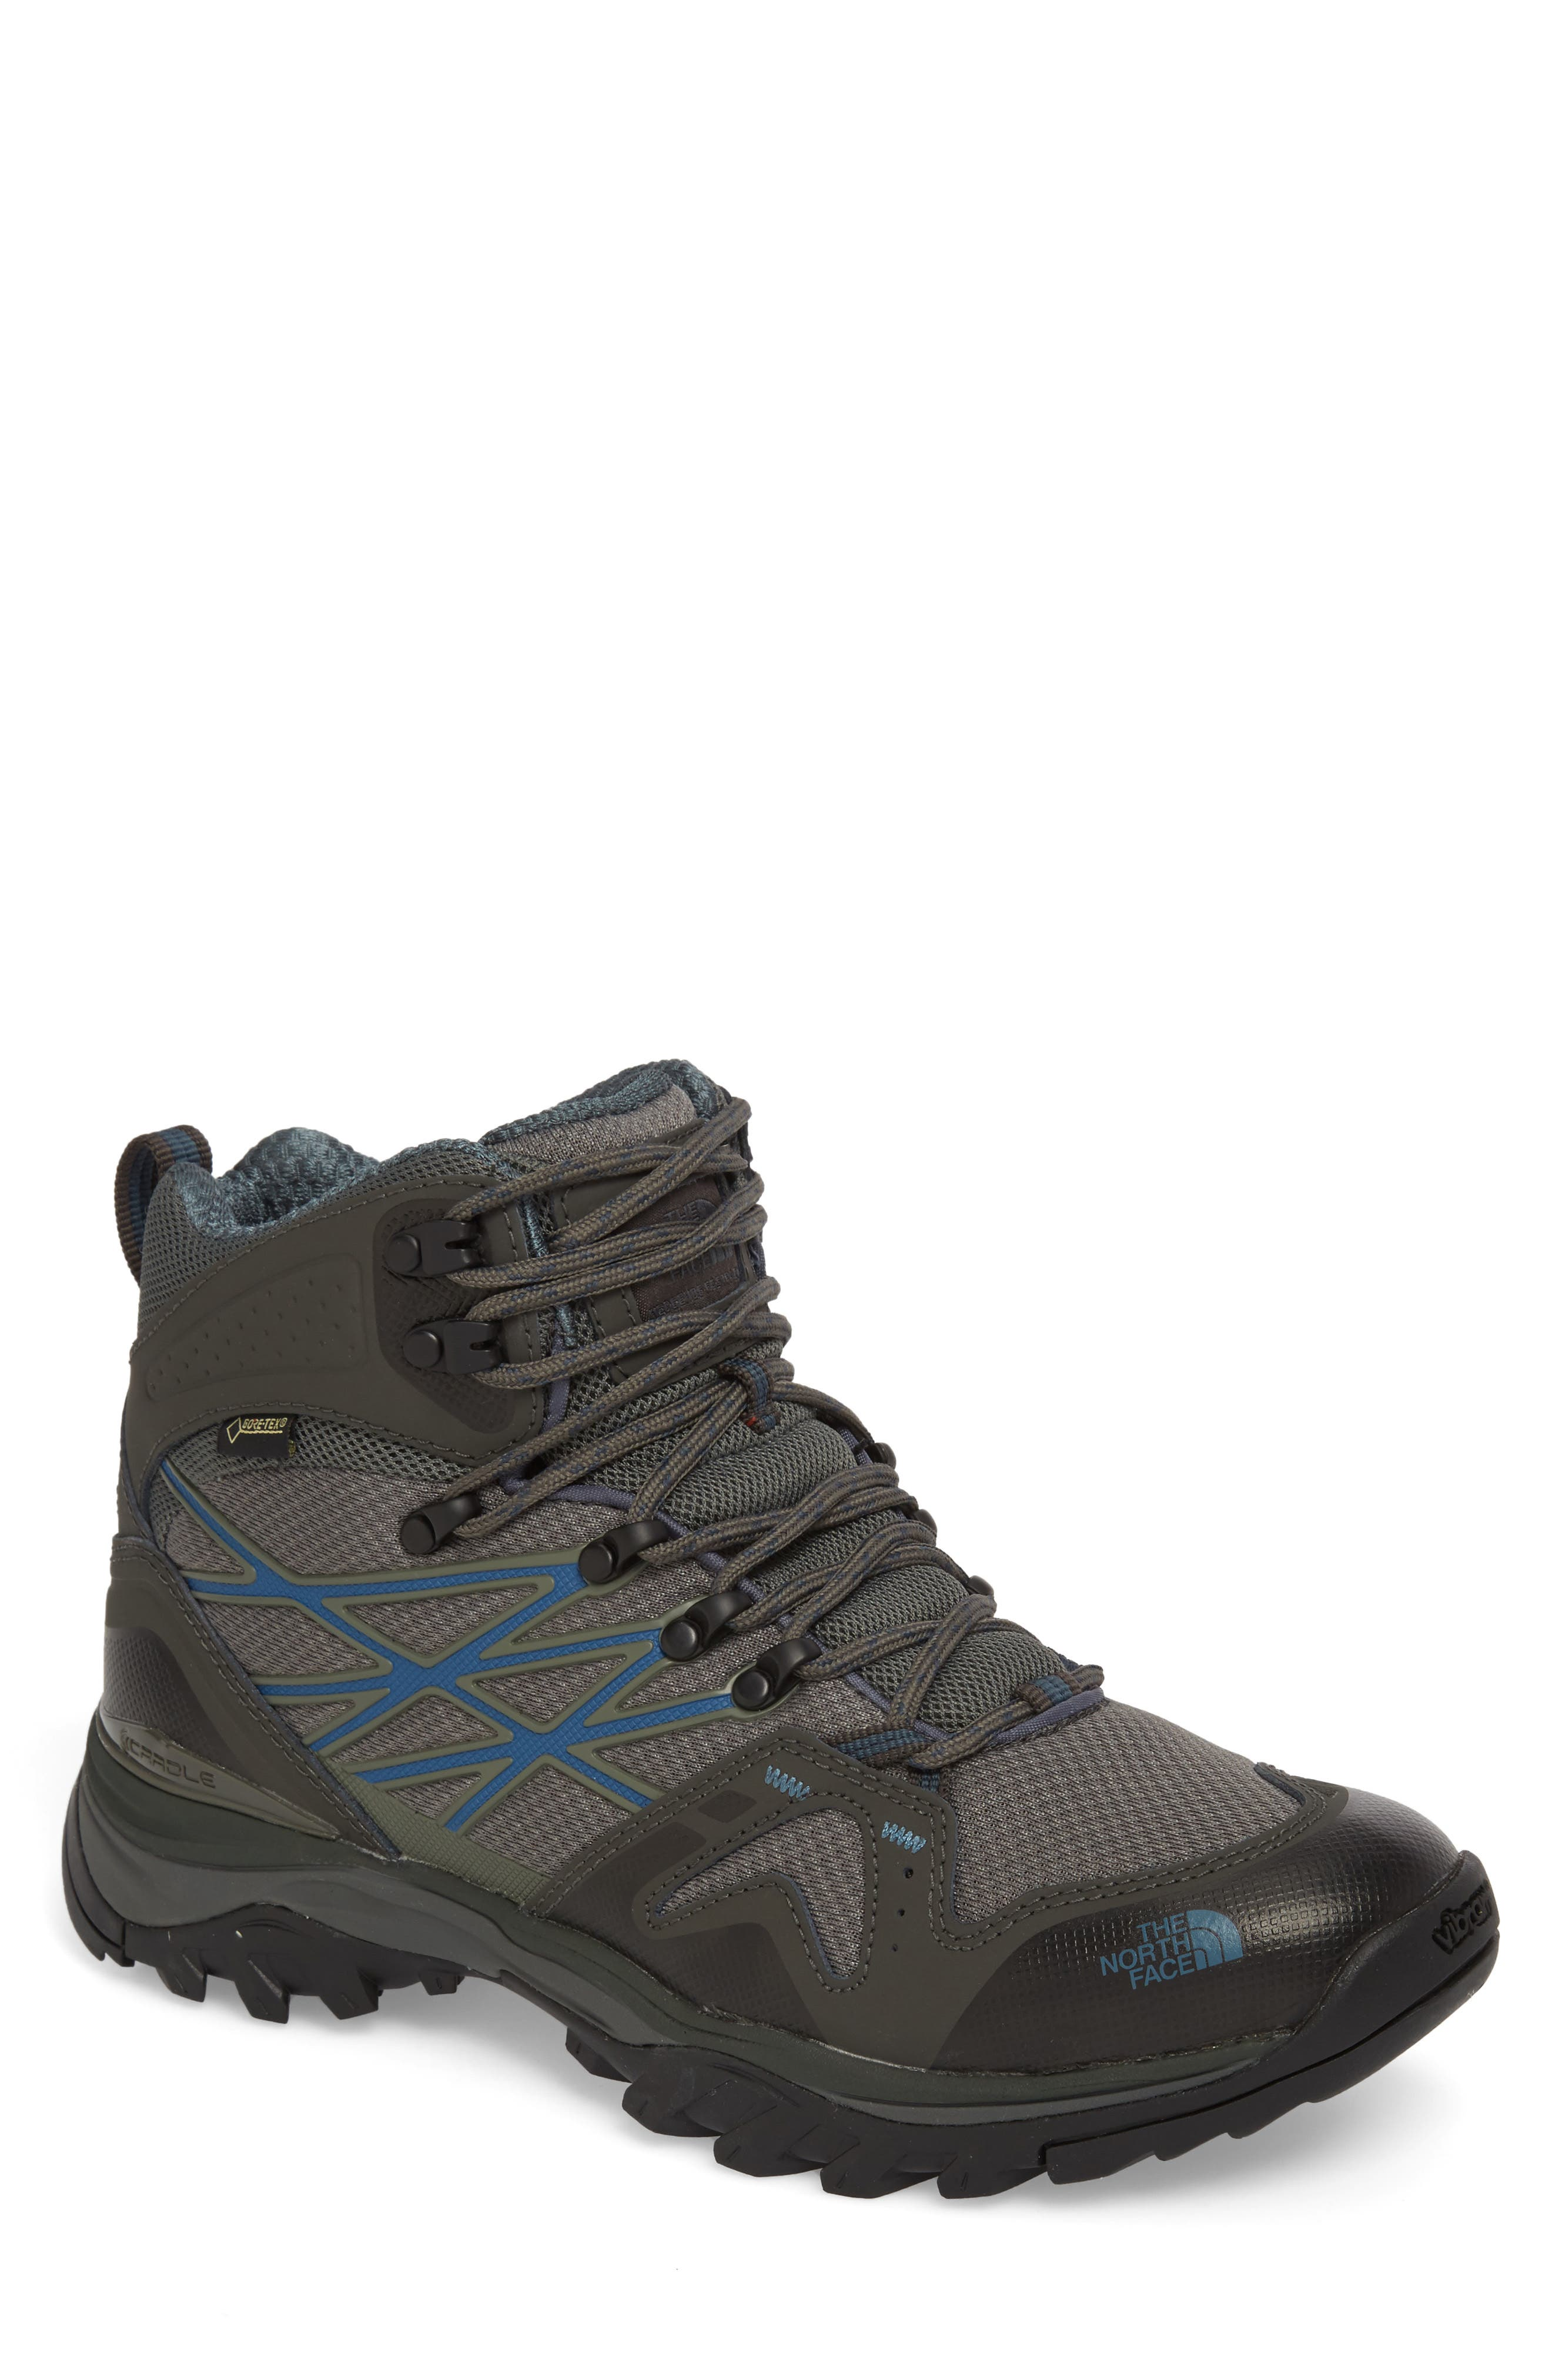 Hedgehog Fastpack Mid Gore-Tex<sup>®</sup> Waterproof Hiking Shoe,                             Main thumbnail 1, color,                             020